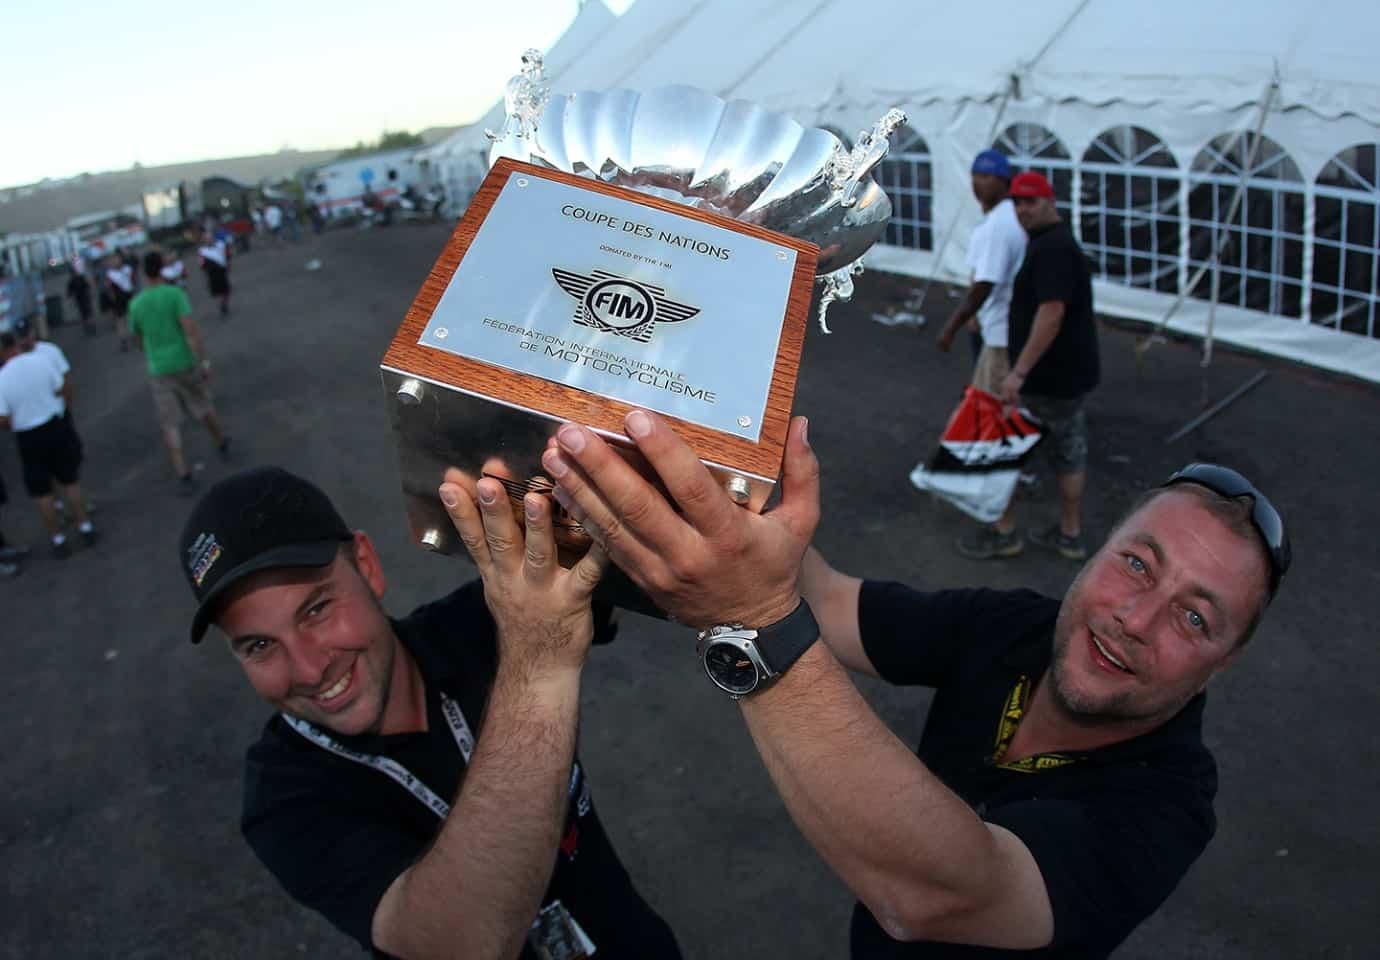 Motocoss of Nations 2010 in Lakewood, Colorado - Andreas Kosbahn und Olaf Noack mit dem Pokal für den dritten Rang